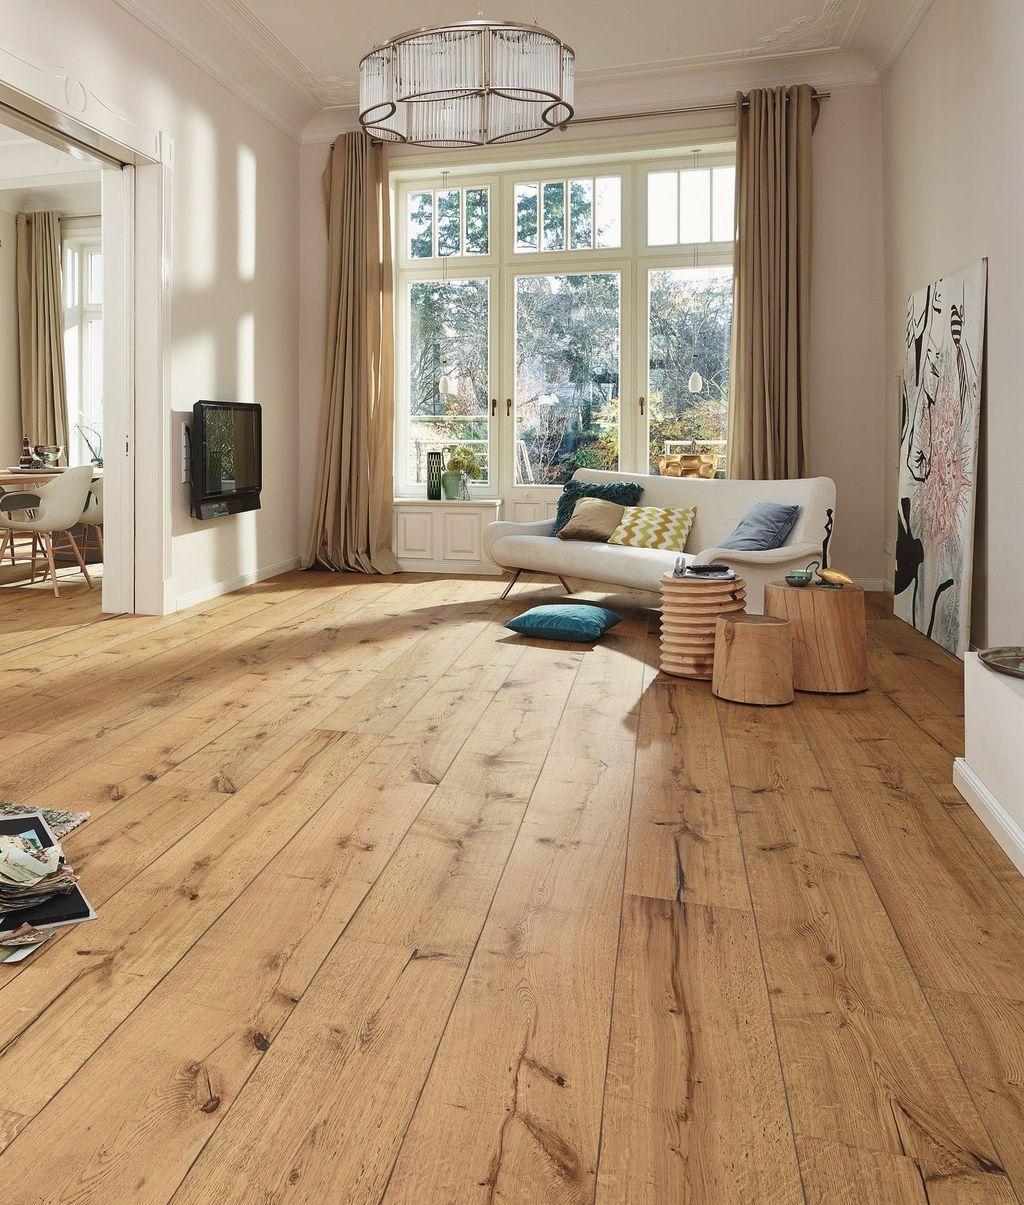 living room, wooden floor, white wall, white sofa, large window, crystal pendant,